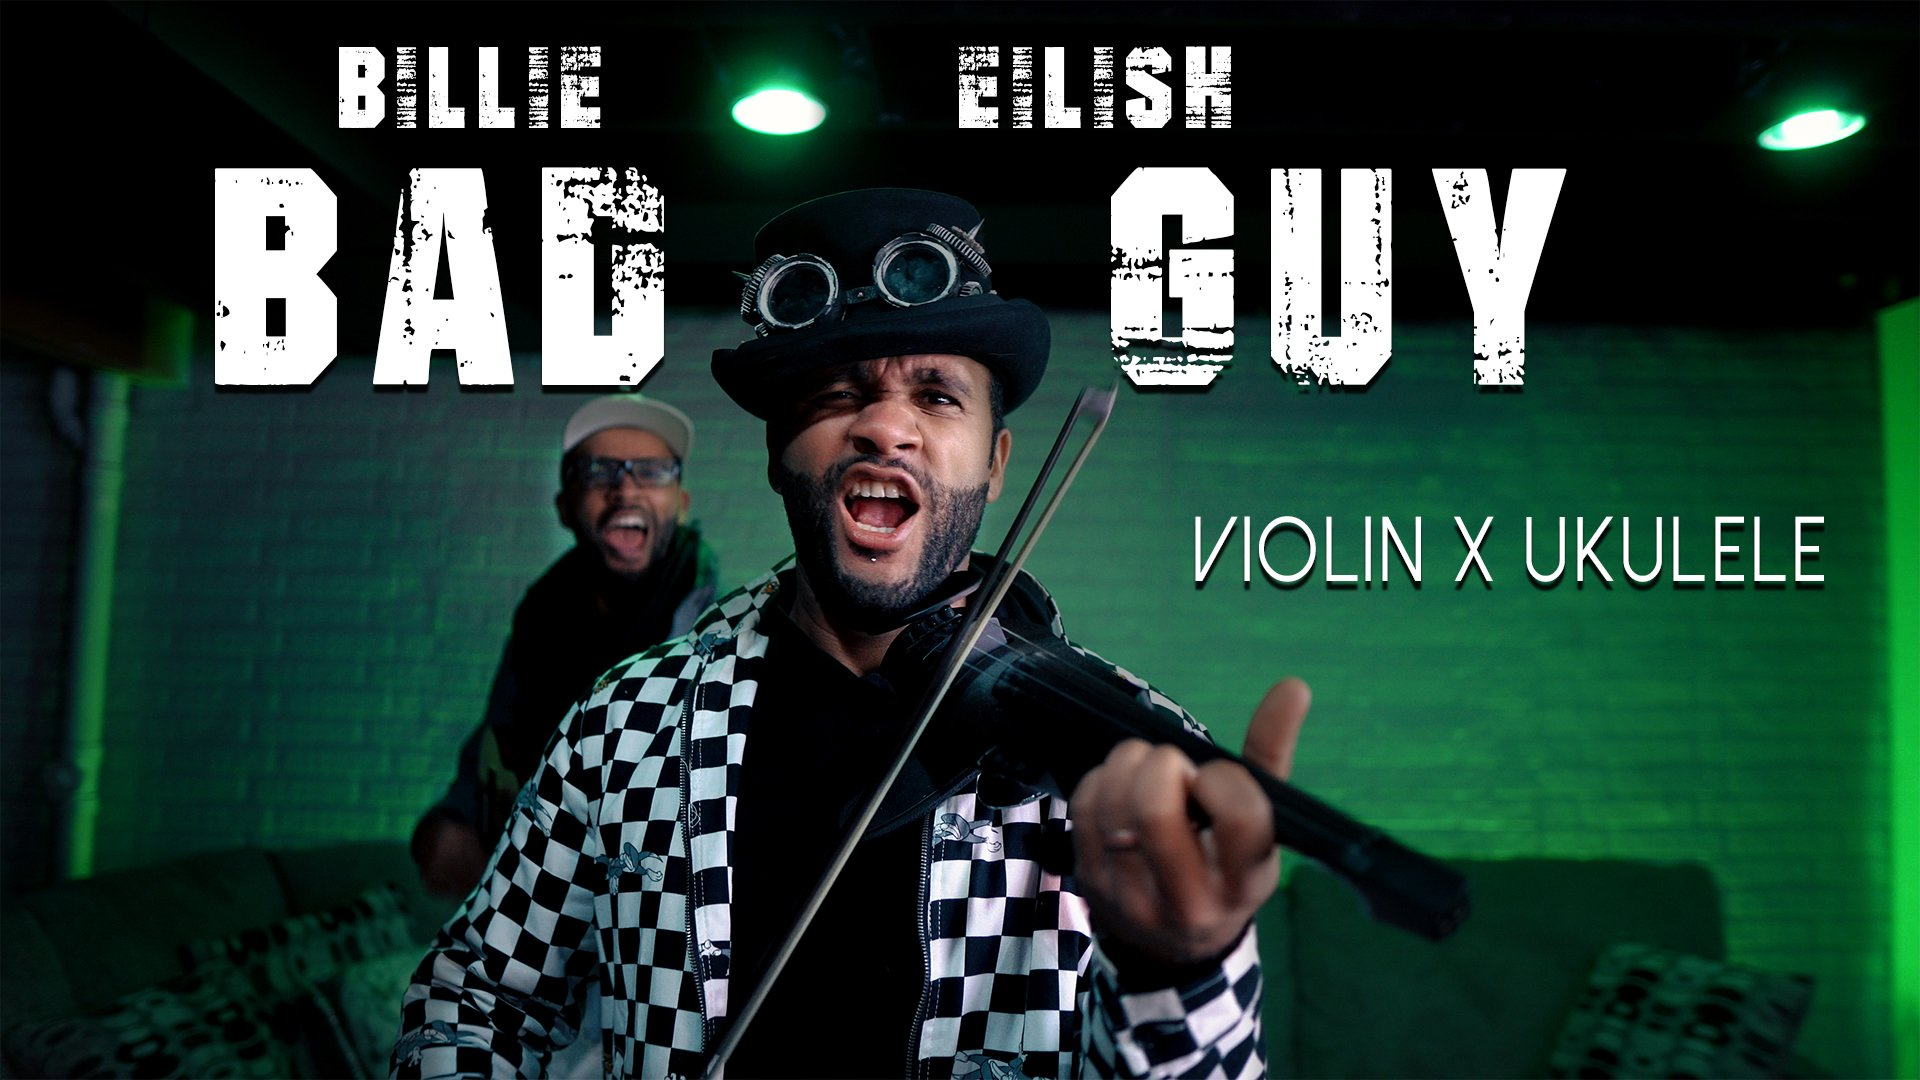 bad guy cover billie eilish b2wins violin ukulele